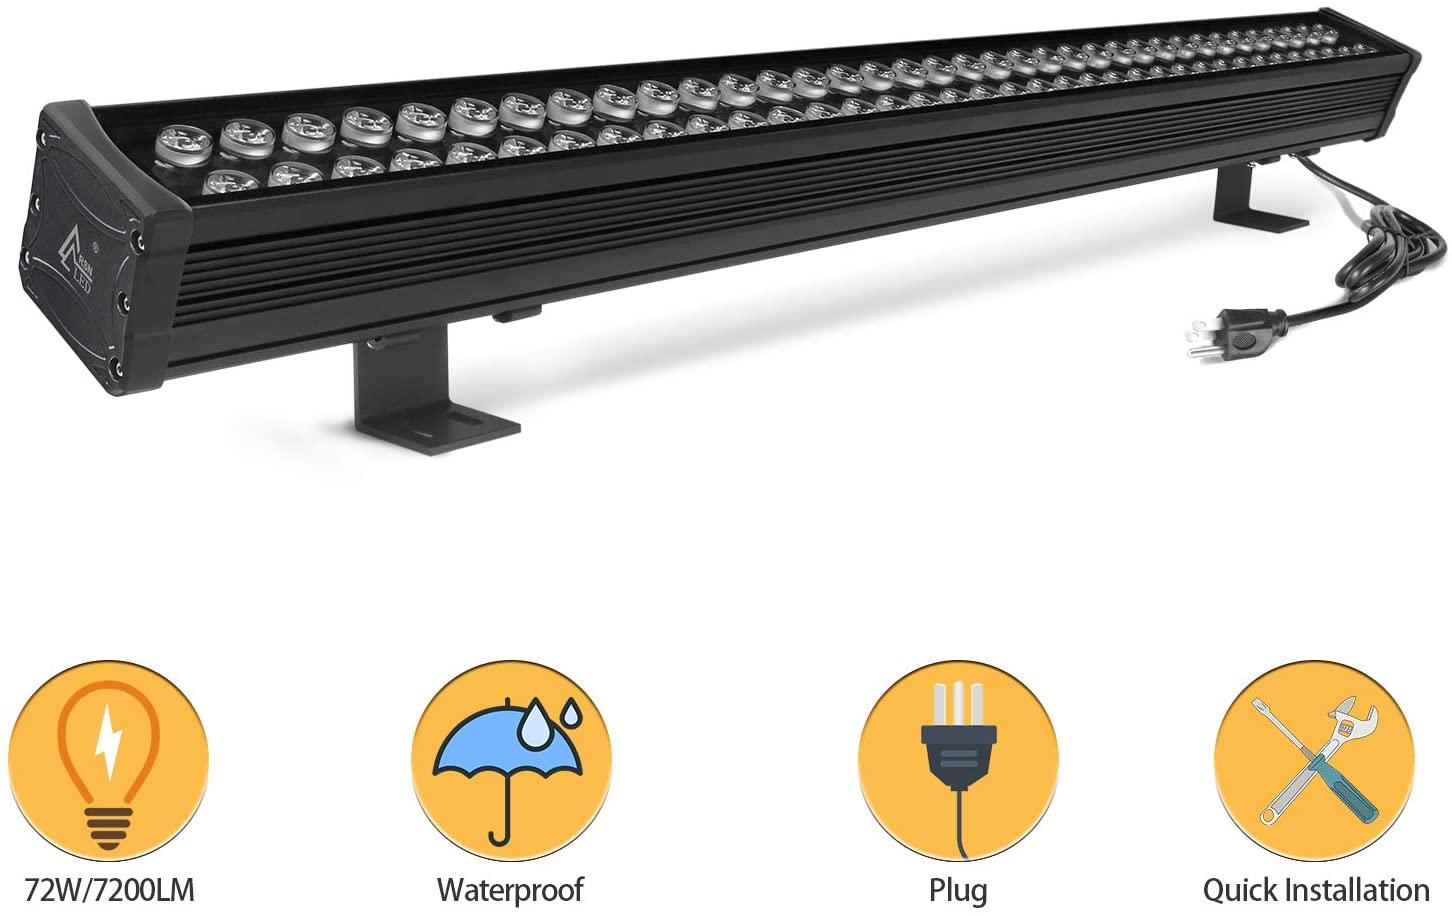 RSN LED 72W Linear Light, 39.5in Wall Washer Light, Linear bar Light for Wall, Bridge, Landscape Lighting and Billboard Lighting, Super Bright 7200 Lumens, 3000K Warm White